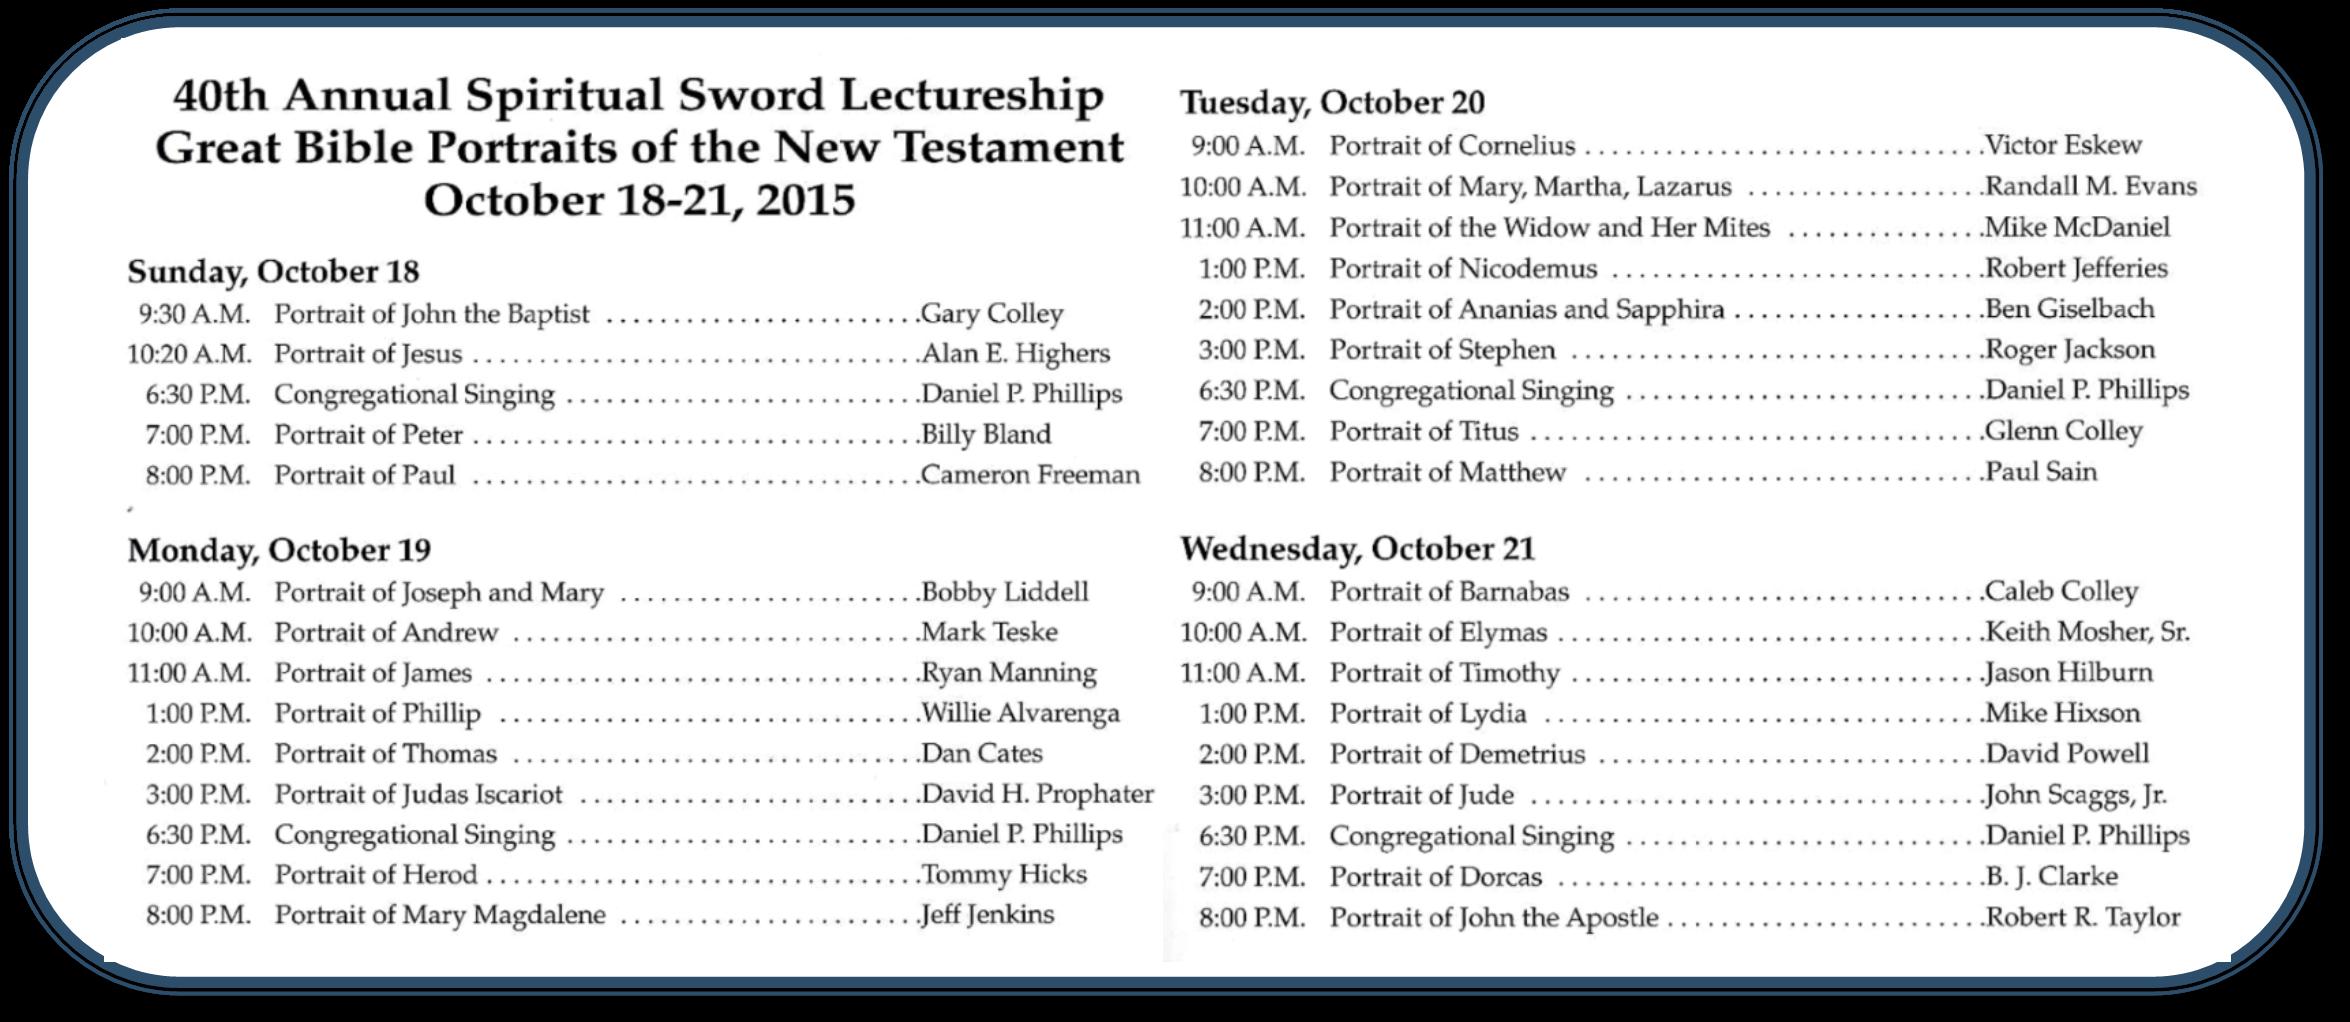 The Spiritual Sword Lectureship 2015